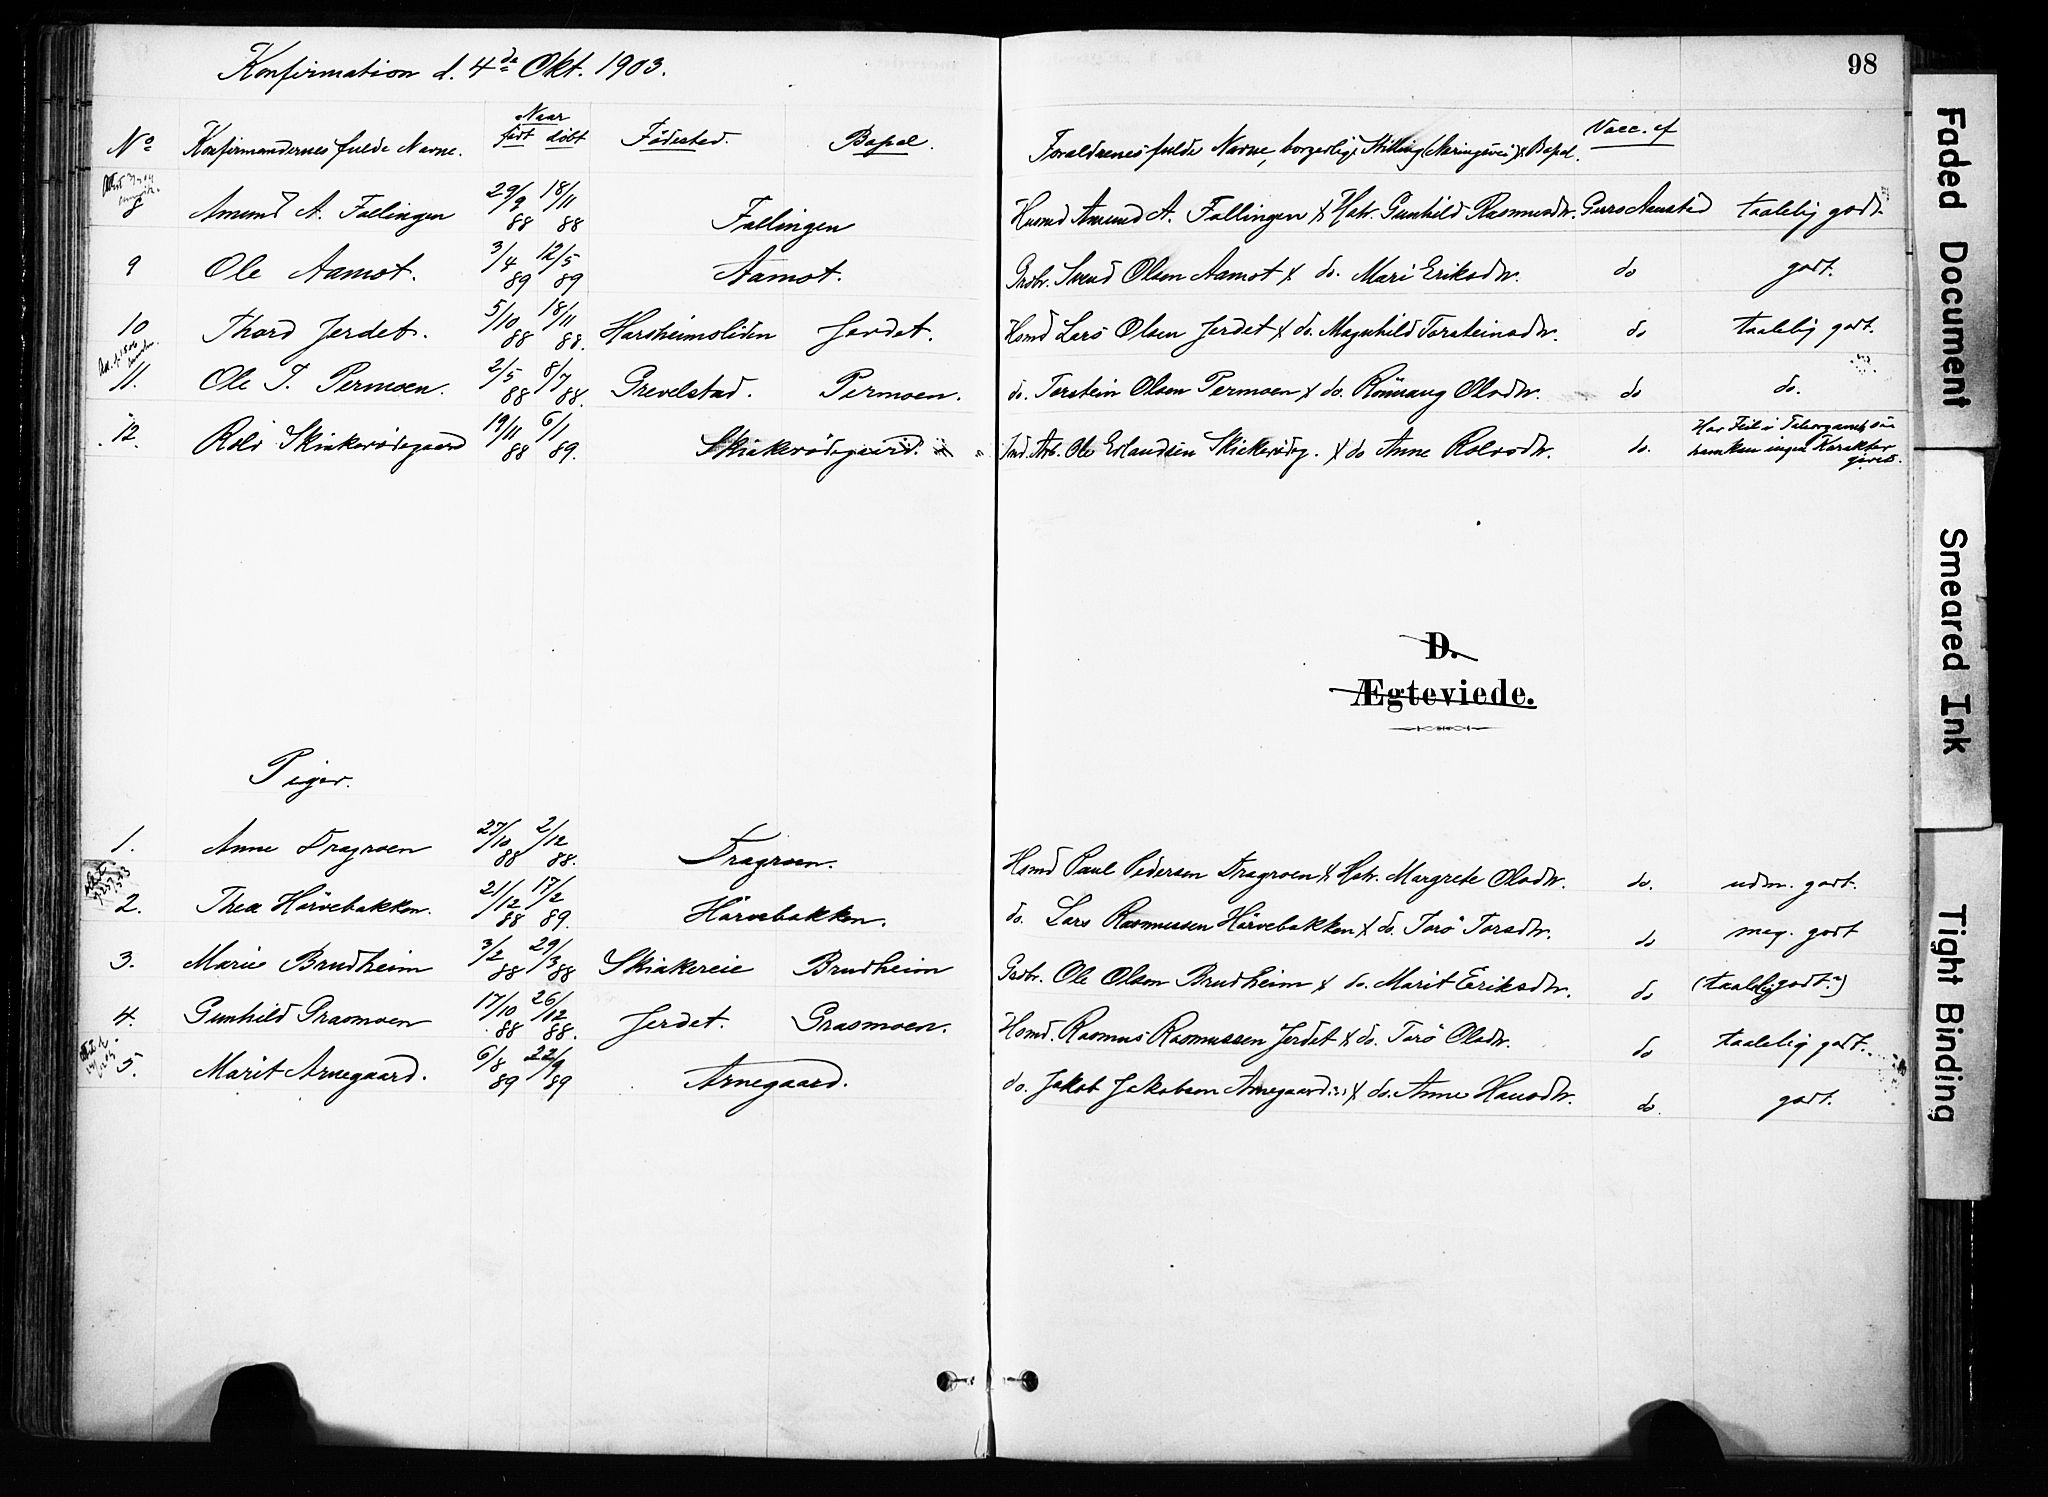 SAH, Skjåk prestekontor, Ministerialbok nr. 4, 1880-1904, s. 98